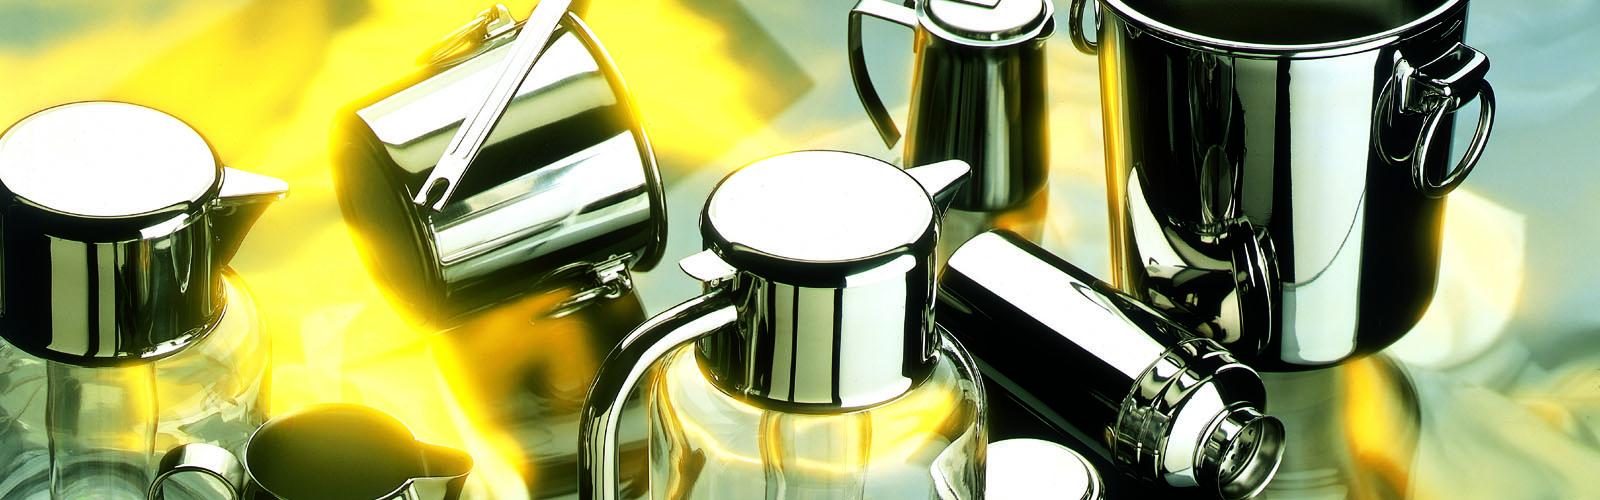 Posate in acciaio made in Italy Mepra S.p.A. posateria ...